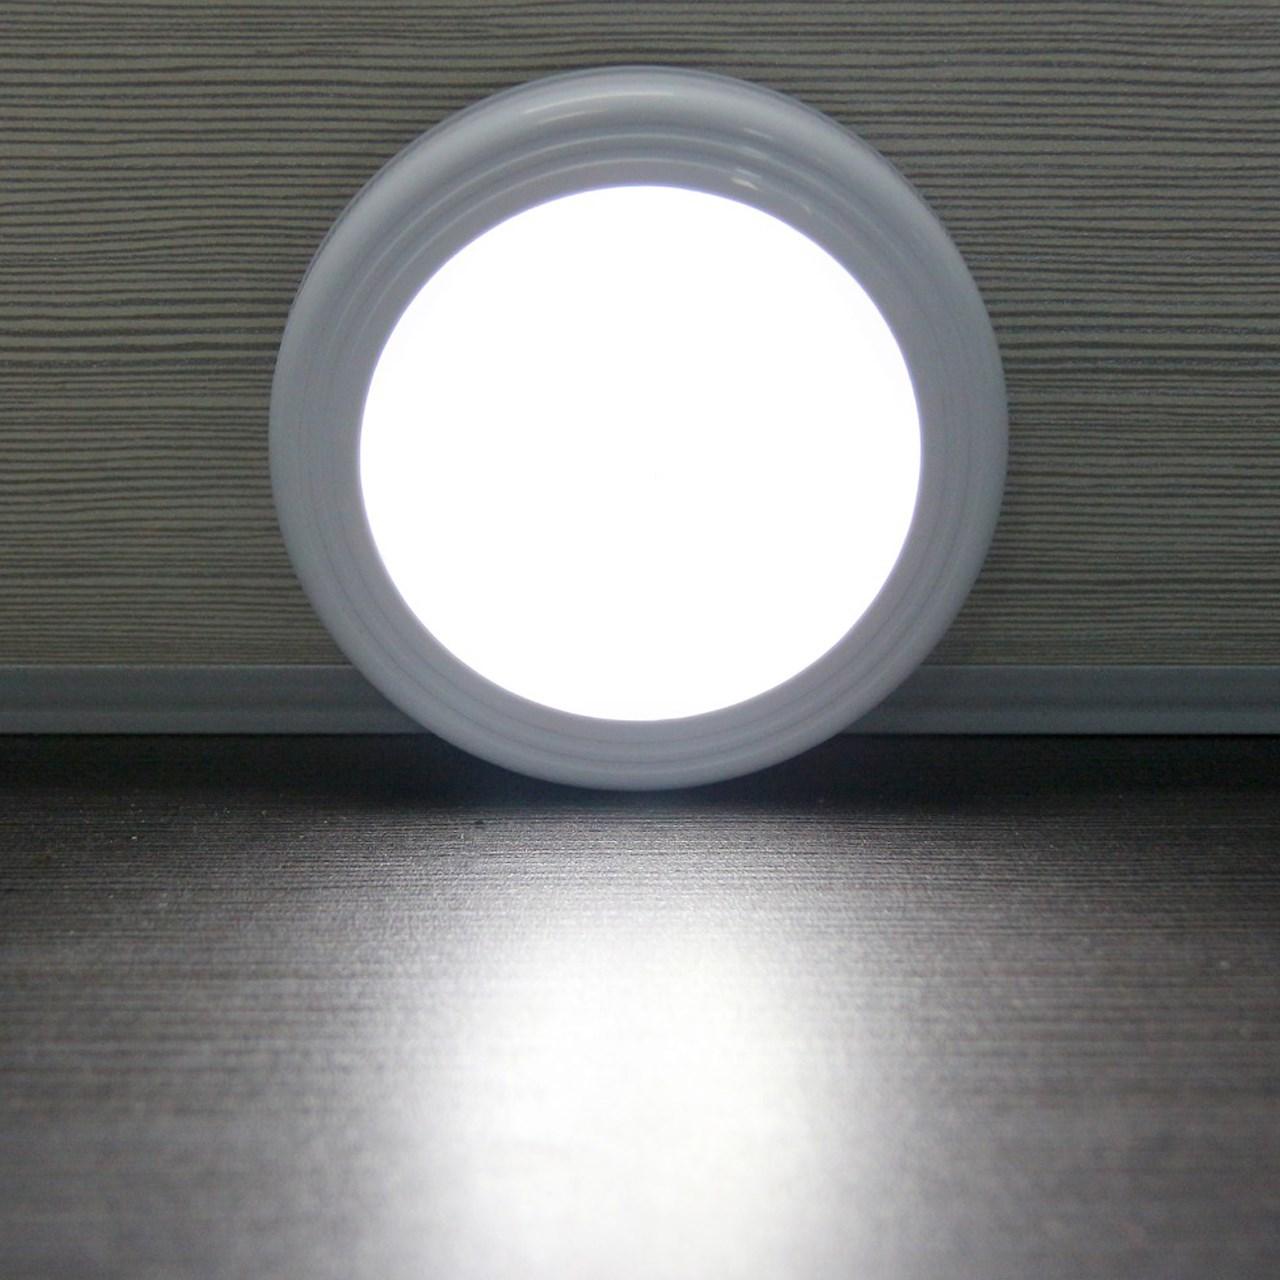 لامپ سنسور حرکتی مدل SE-55